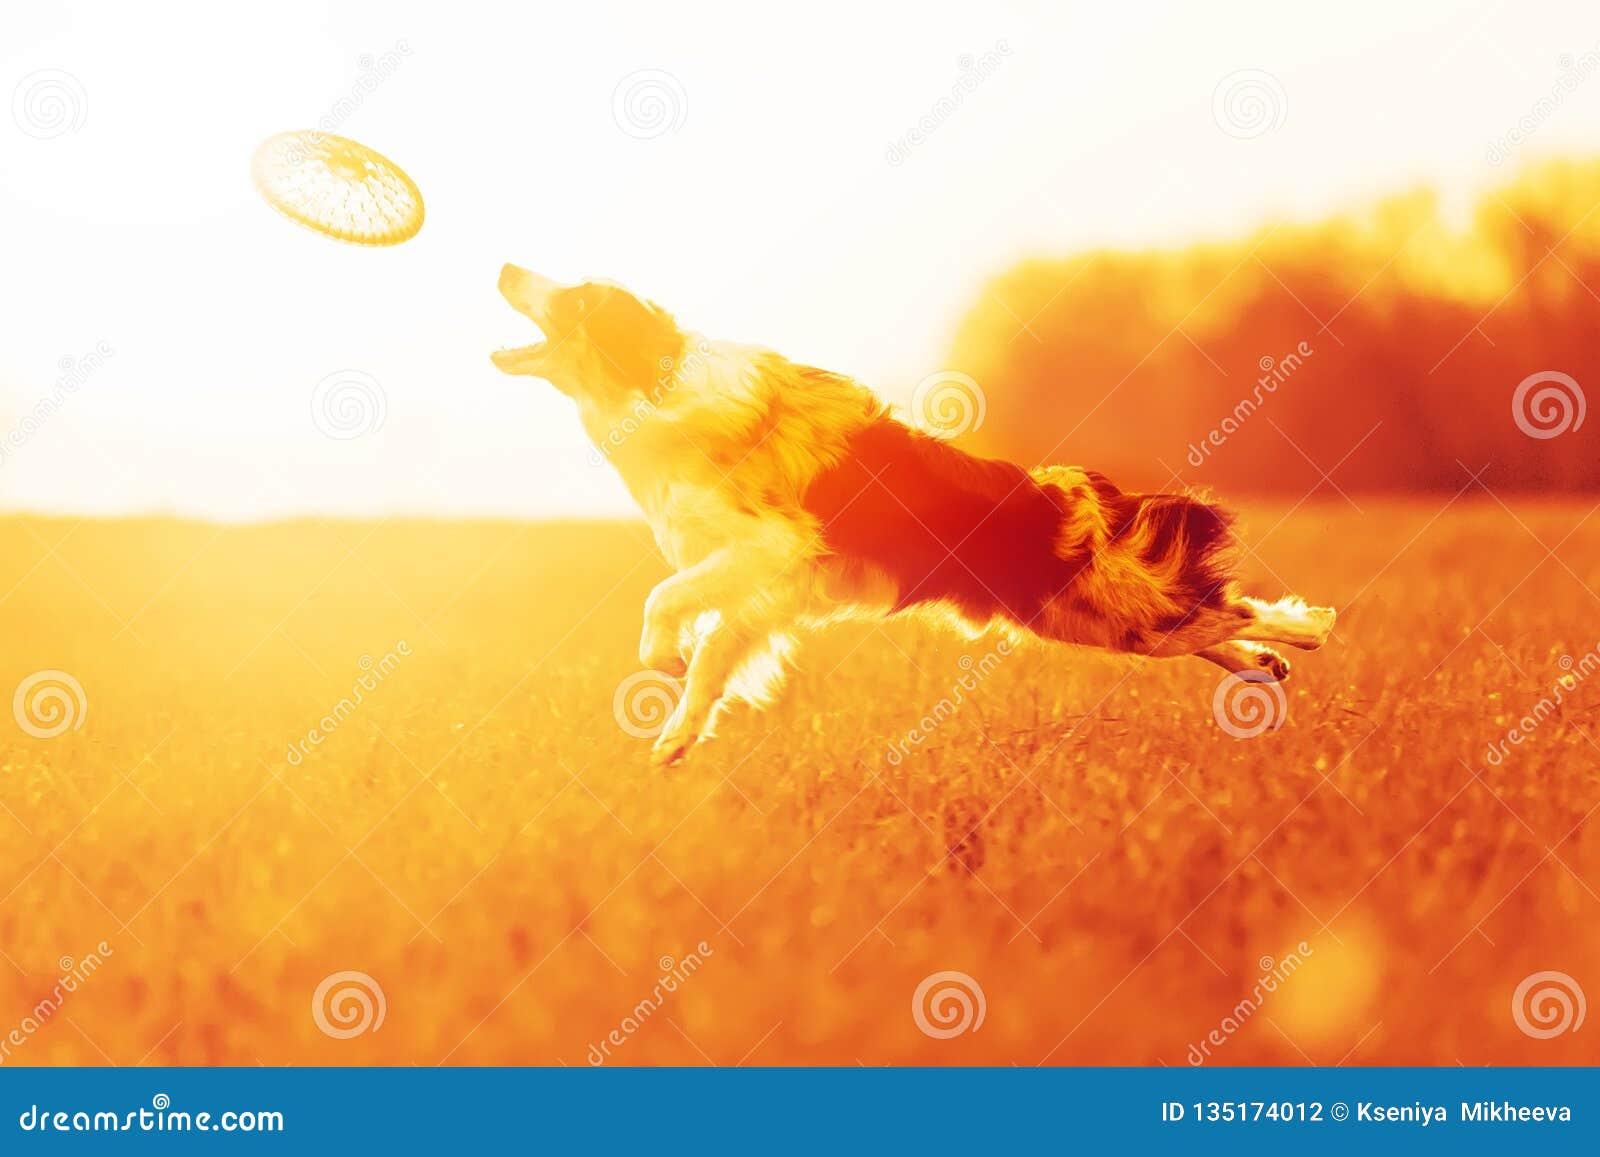 Mramar狗博德牧羊犬跳到在领域的天空